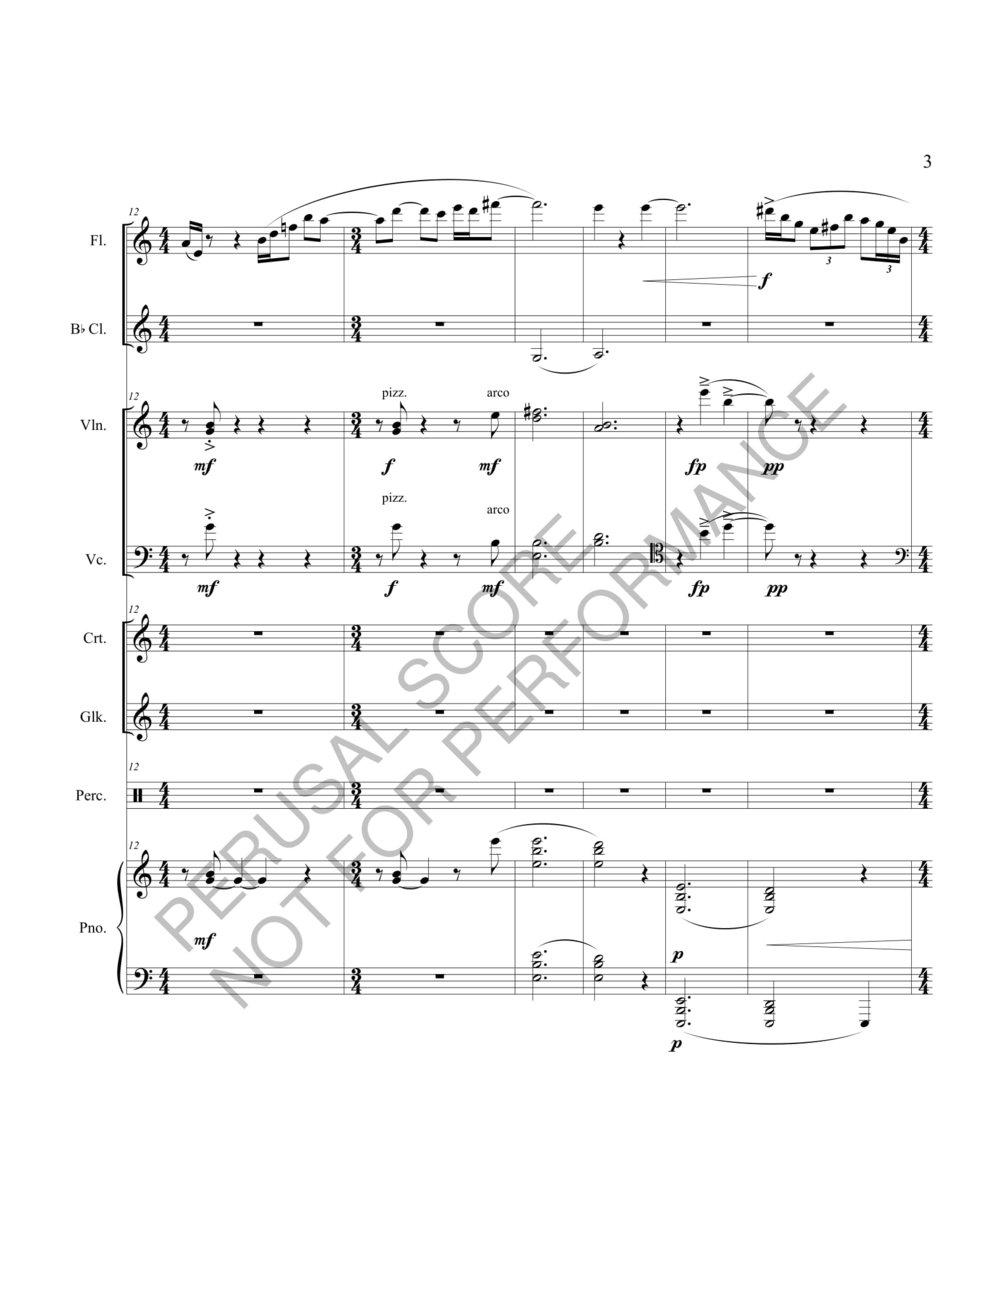 Boyd Terra Liberi Score-watermark-09.jpg